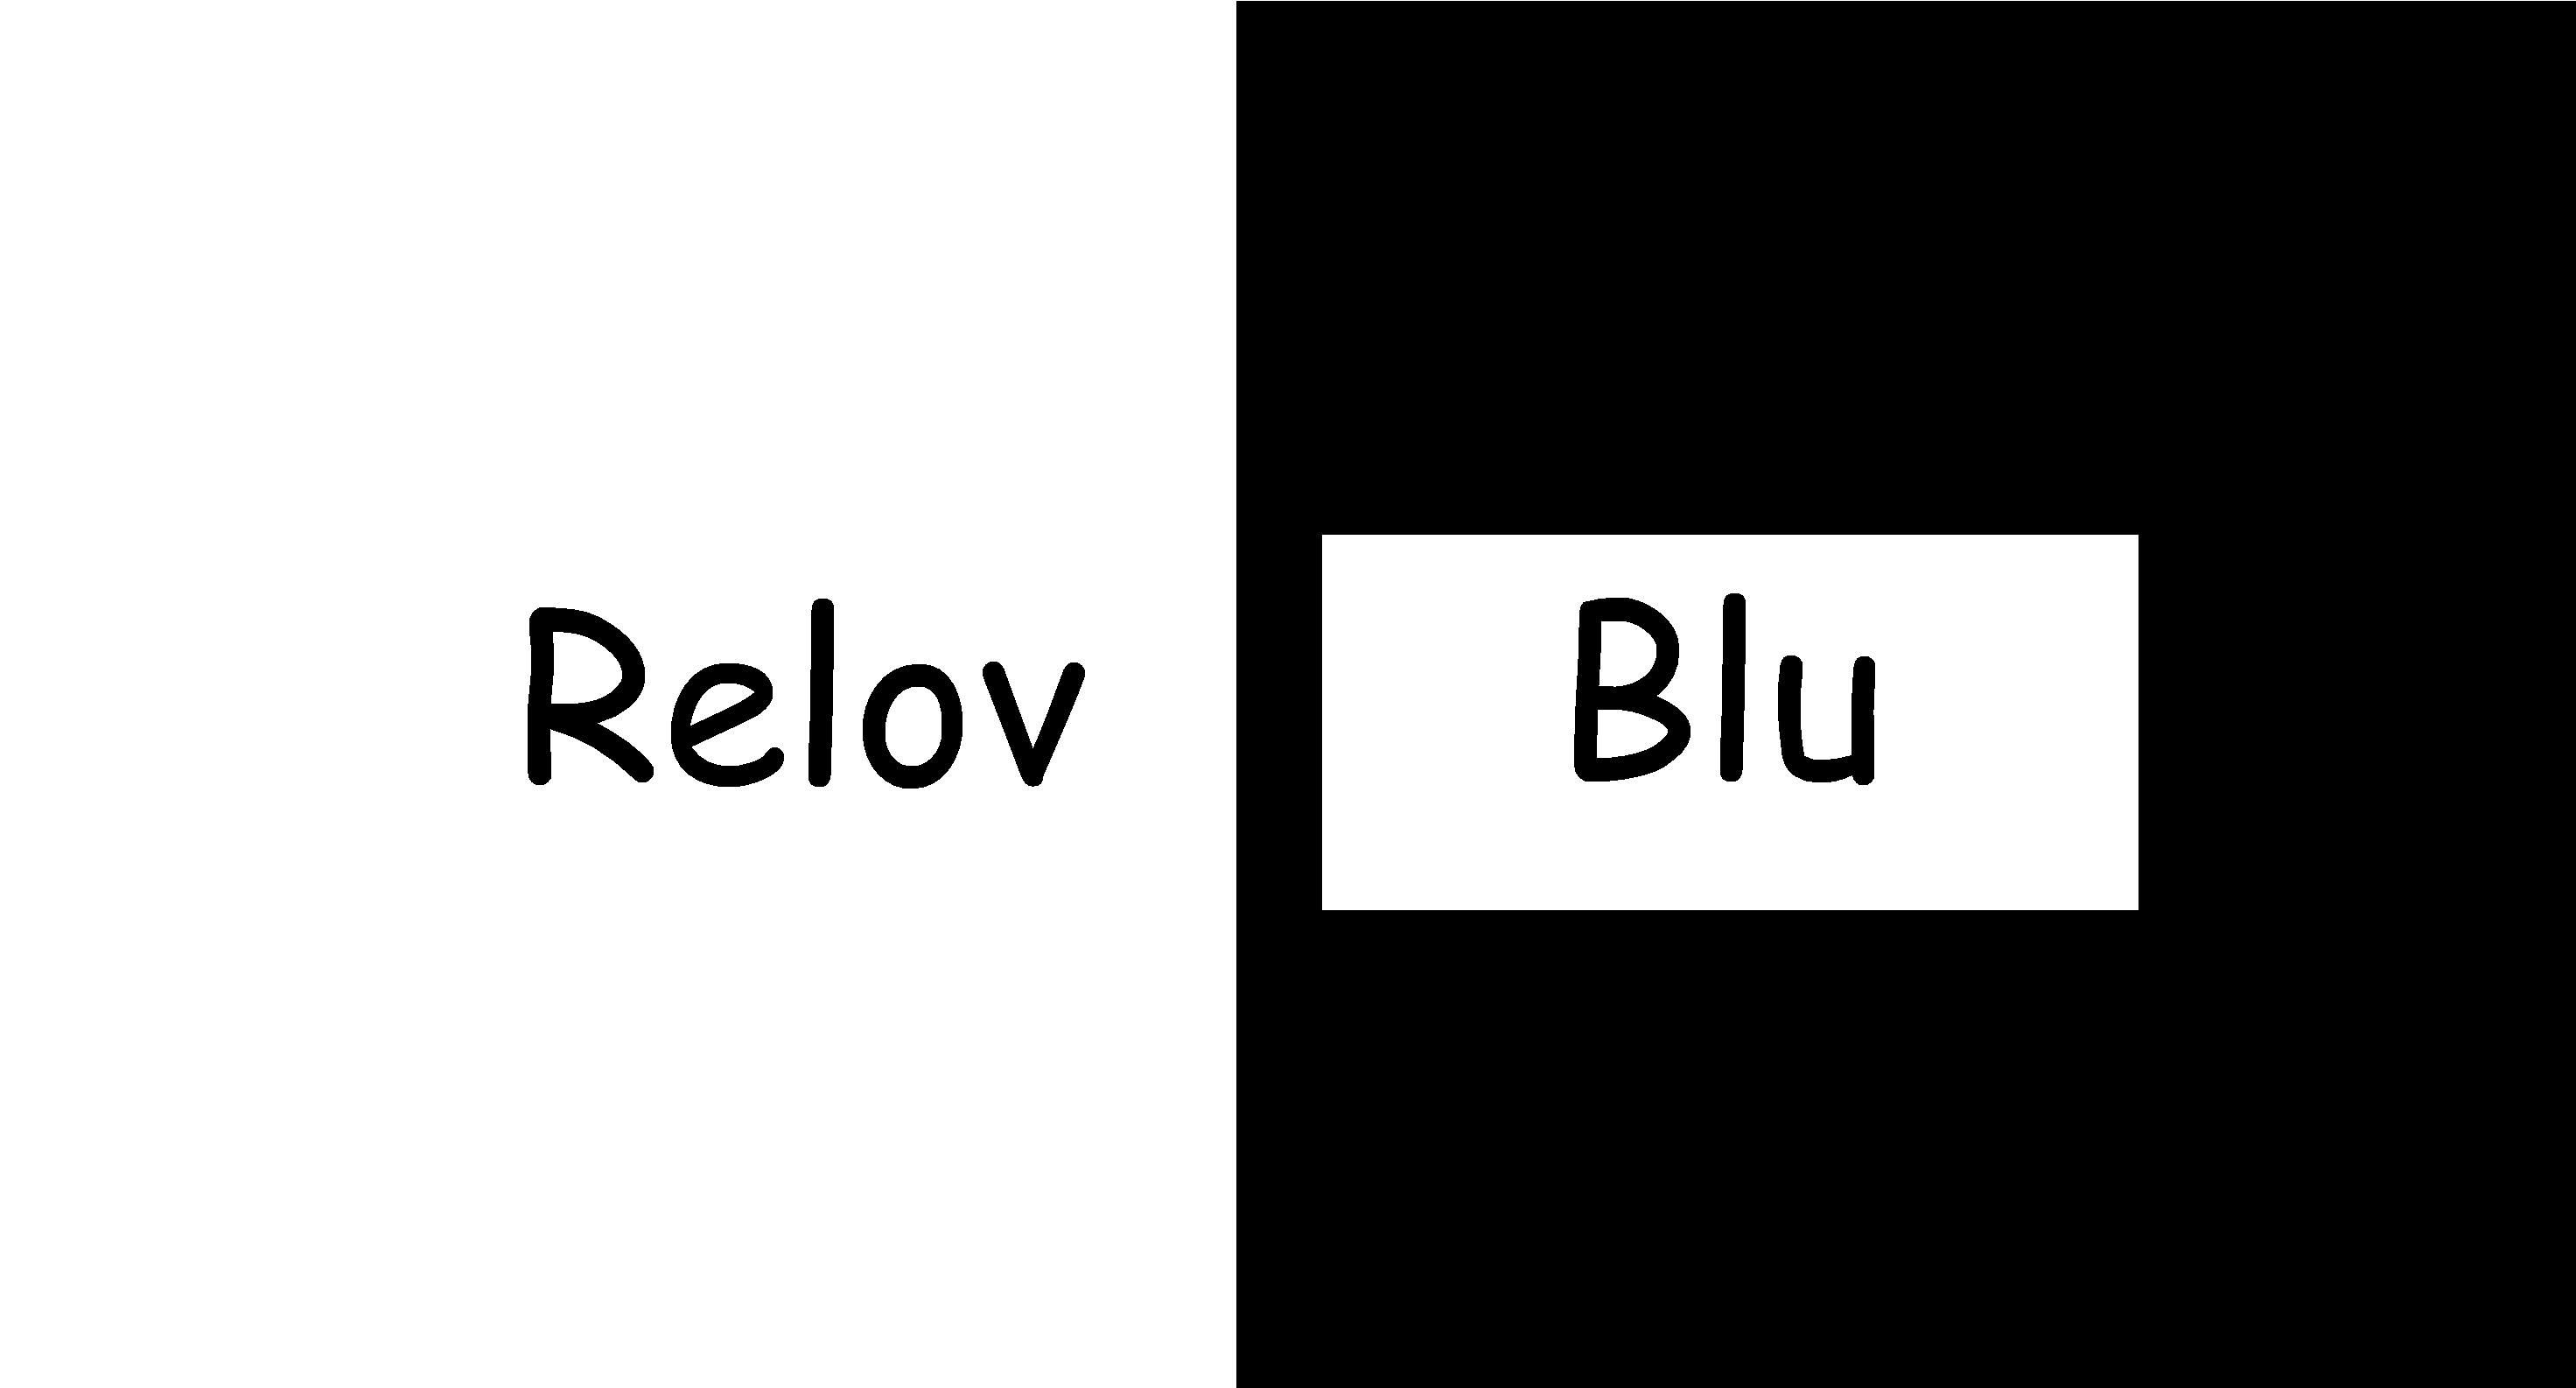 RelovBlu